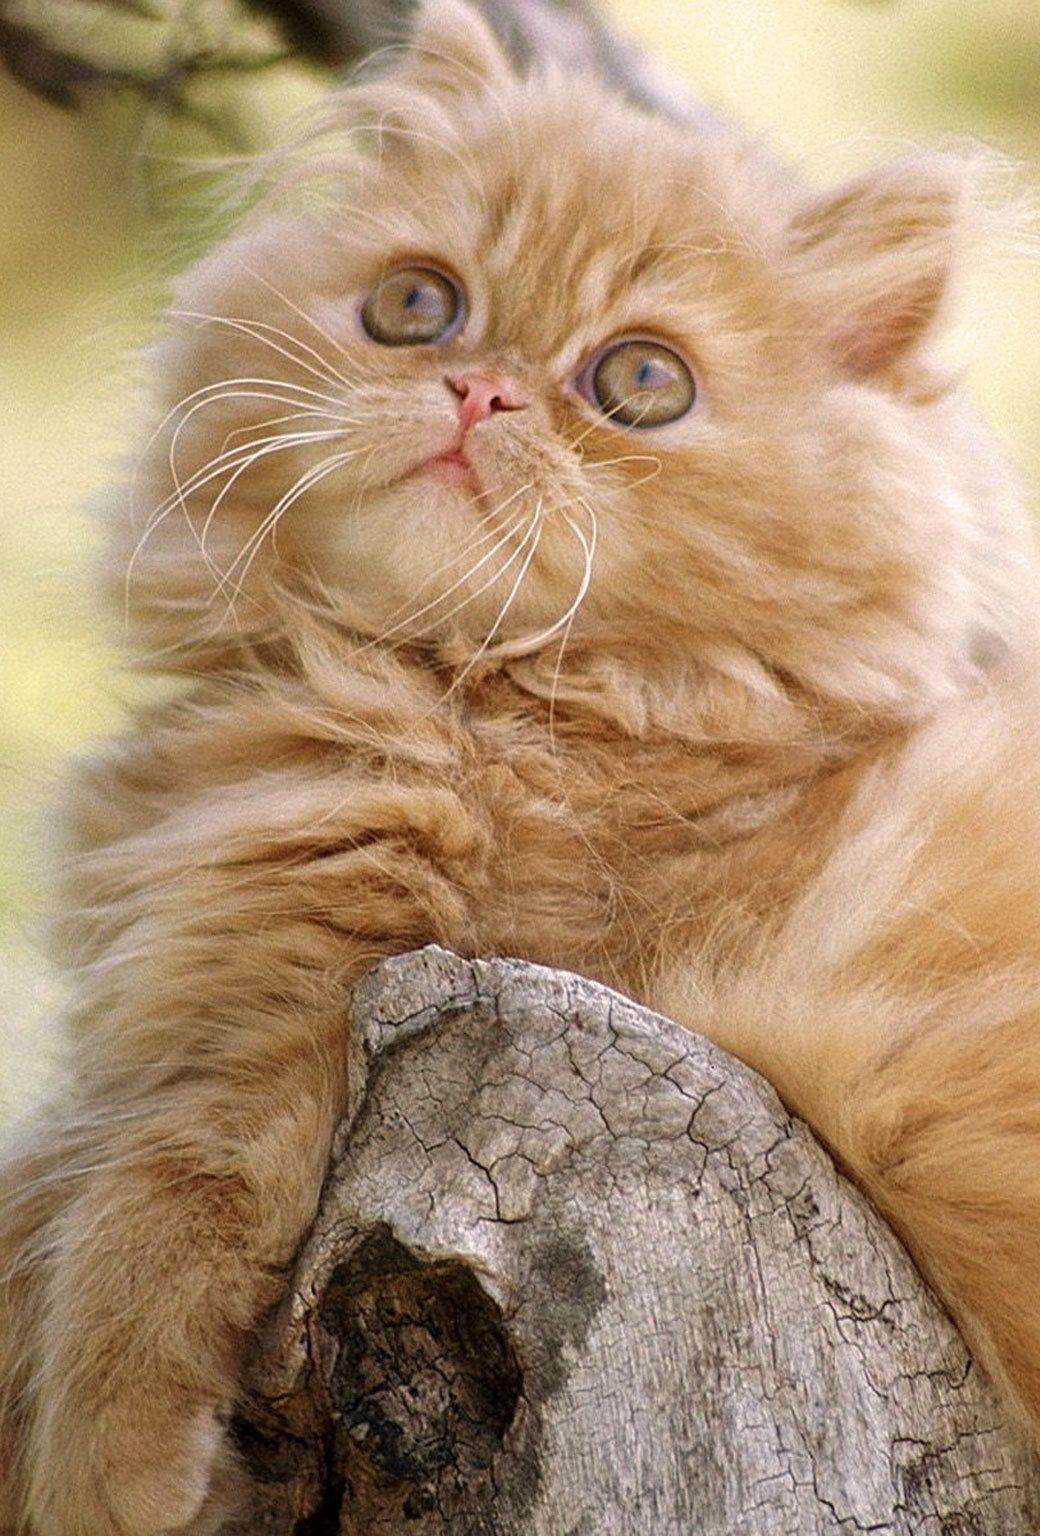 Fluffy cat breeds, Cats